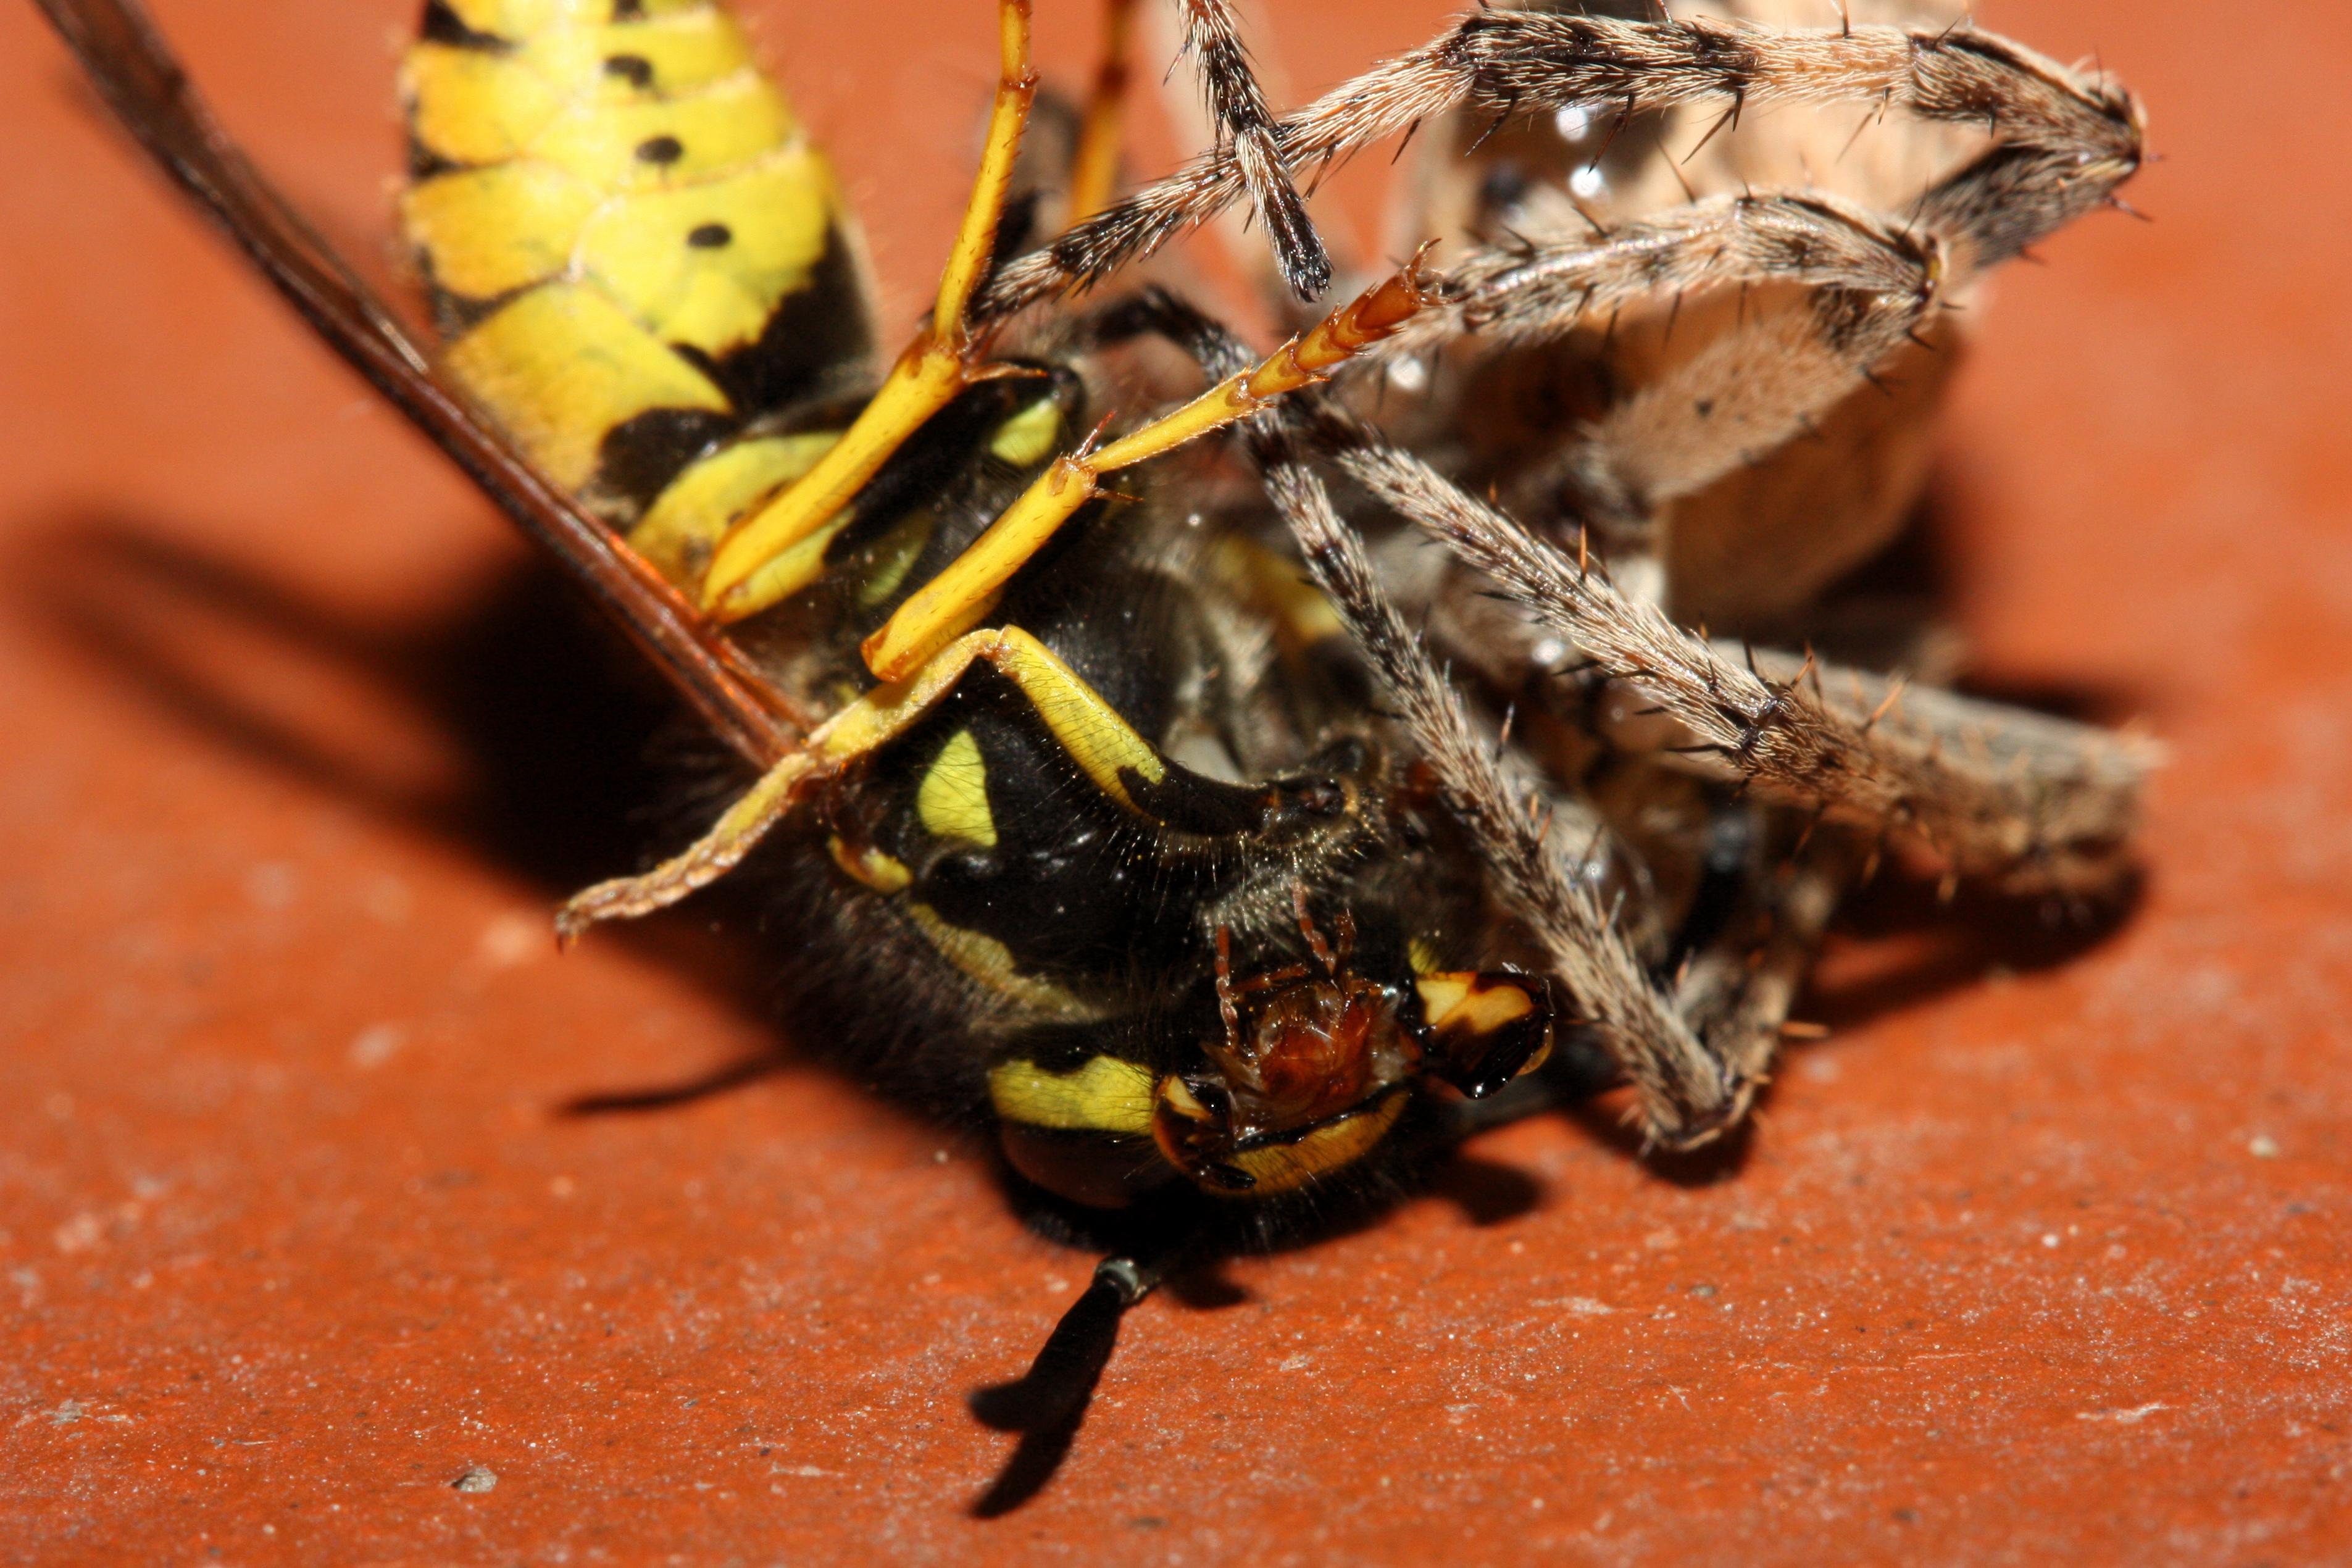 brazilian wandering spider size